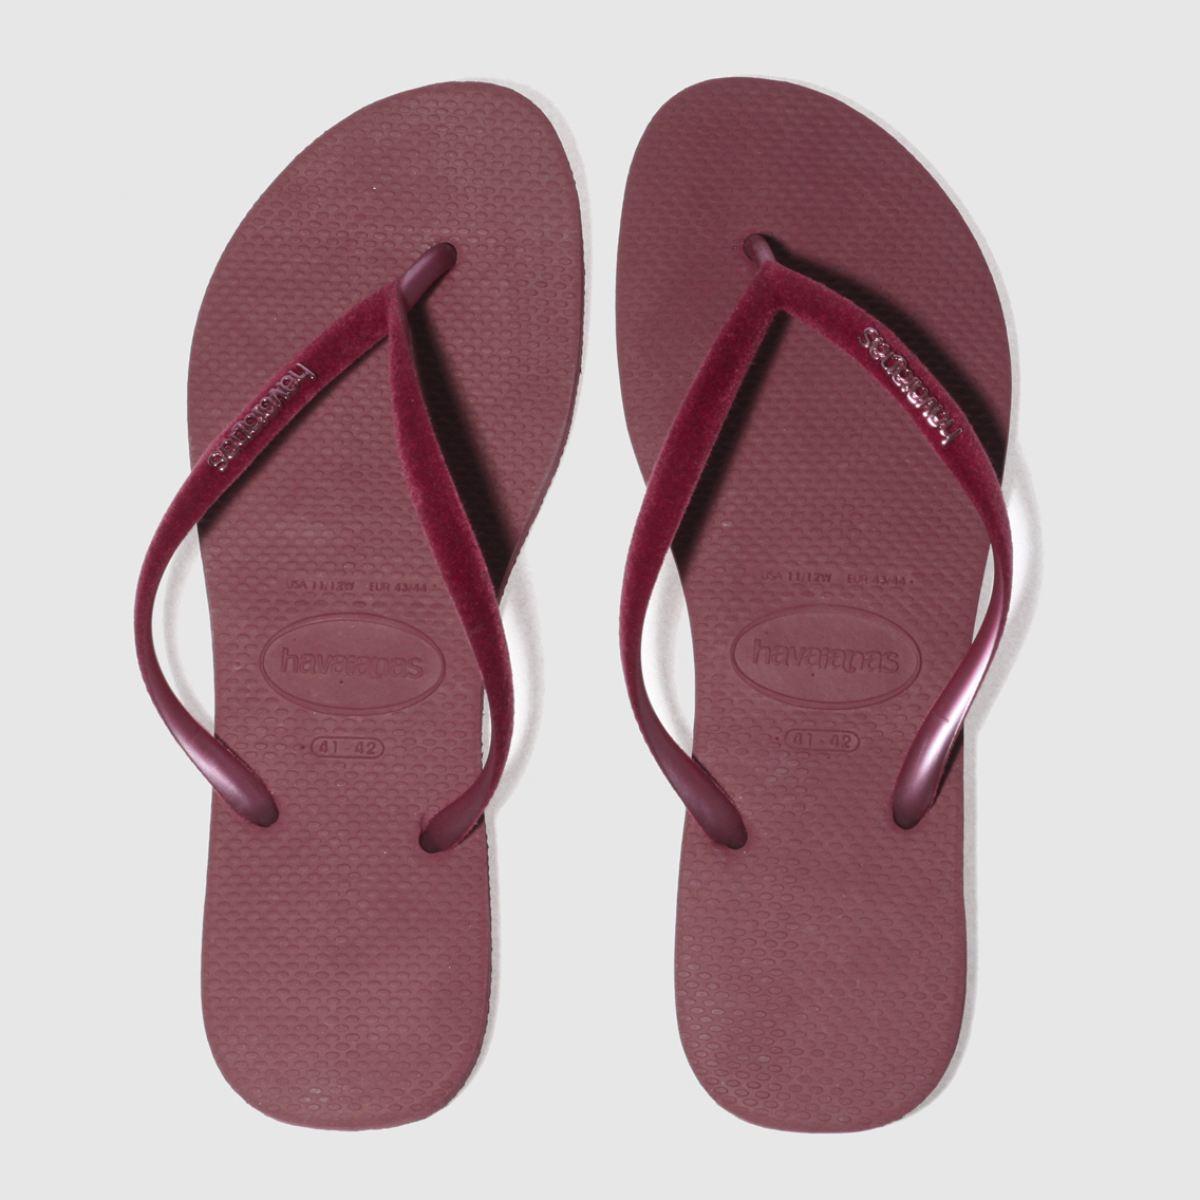 Havaianas Burgundy Slim Velvet Sandals